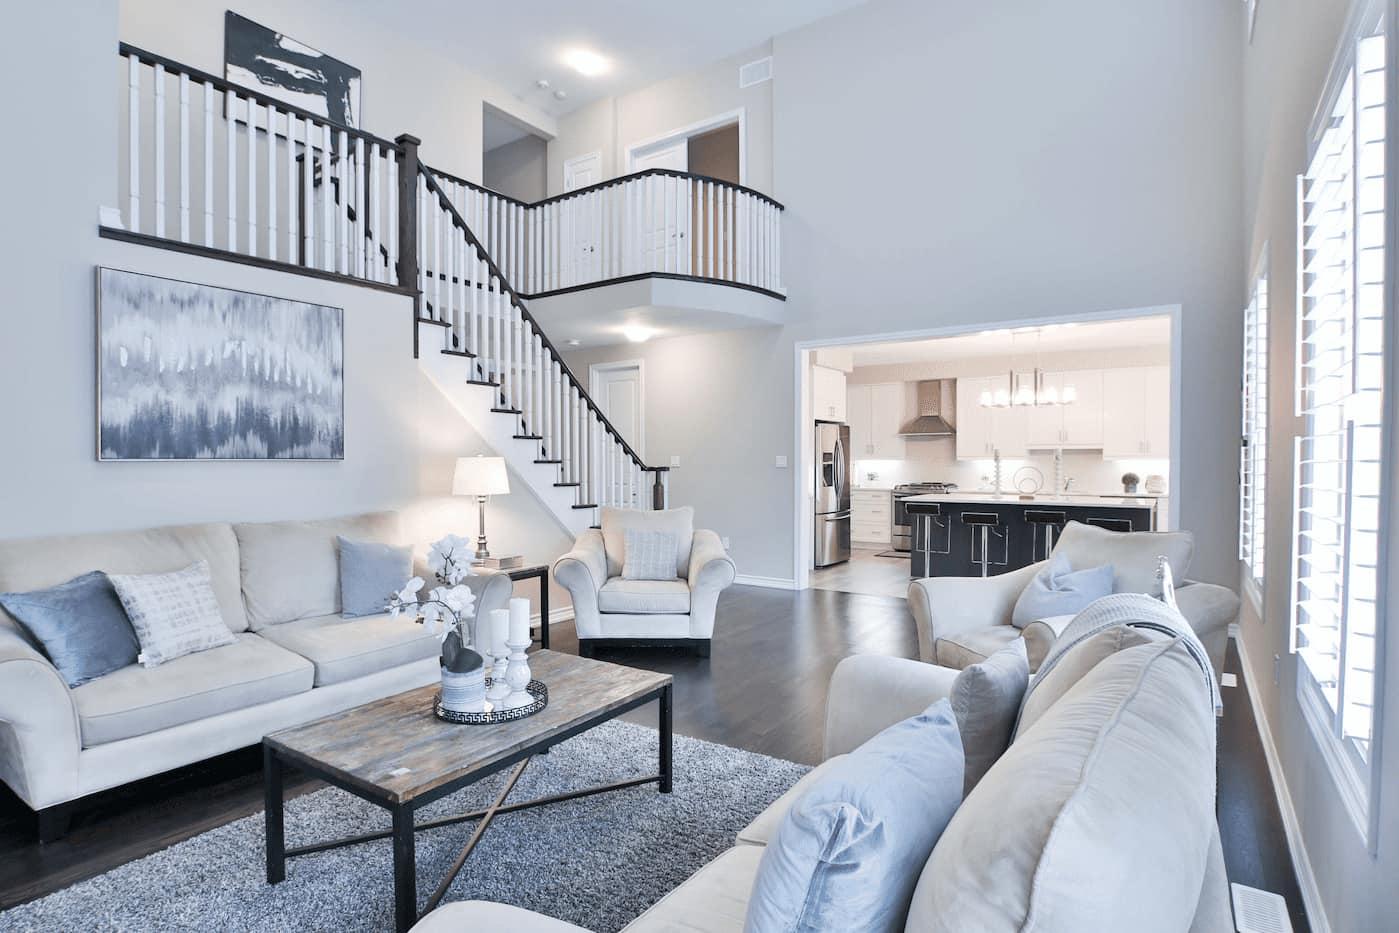 Rental property unit prepared as rent-ready for leasing season